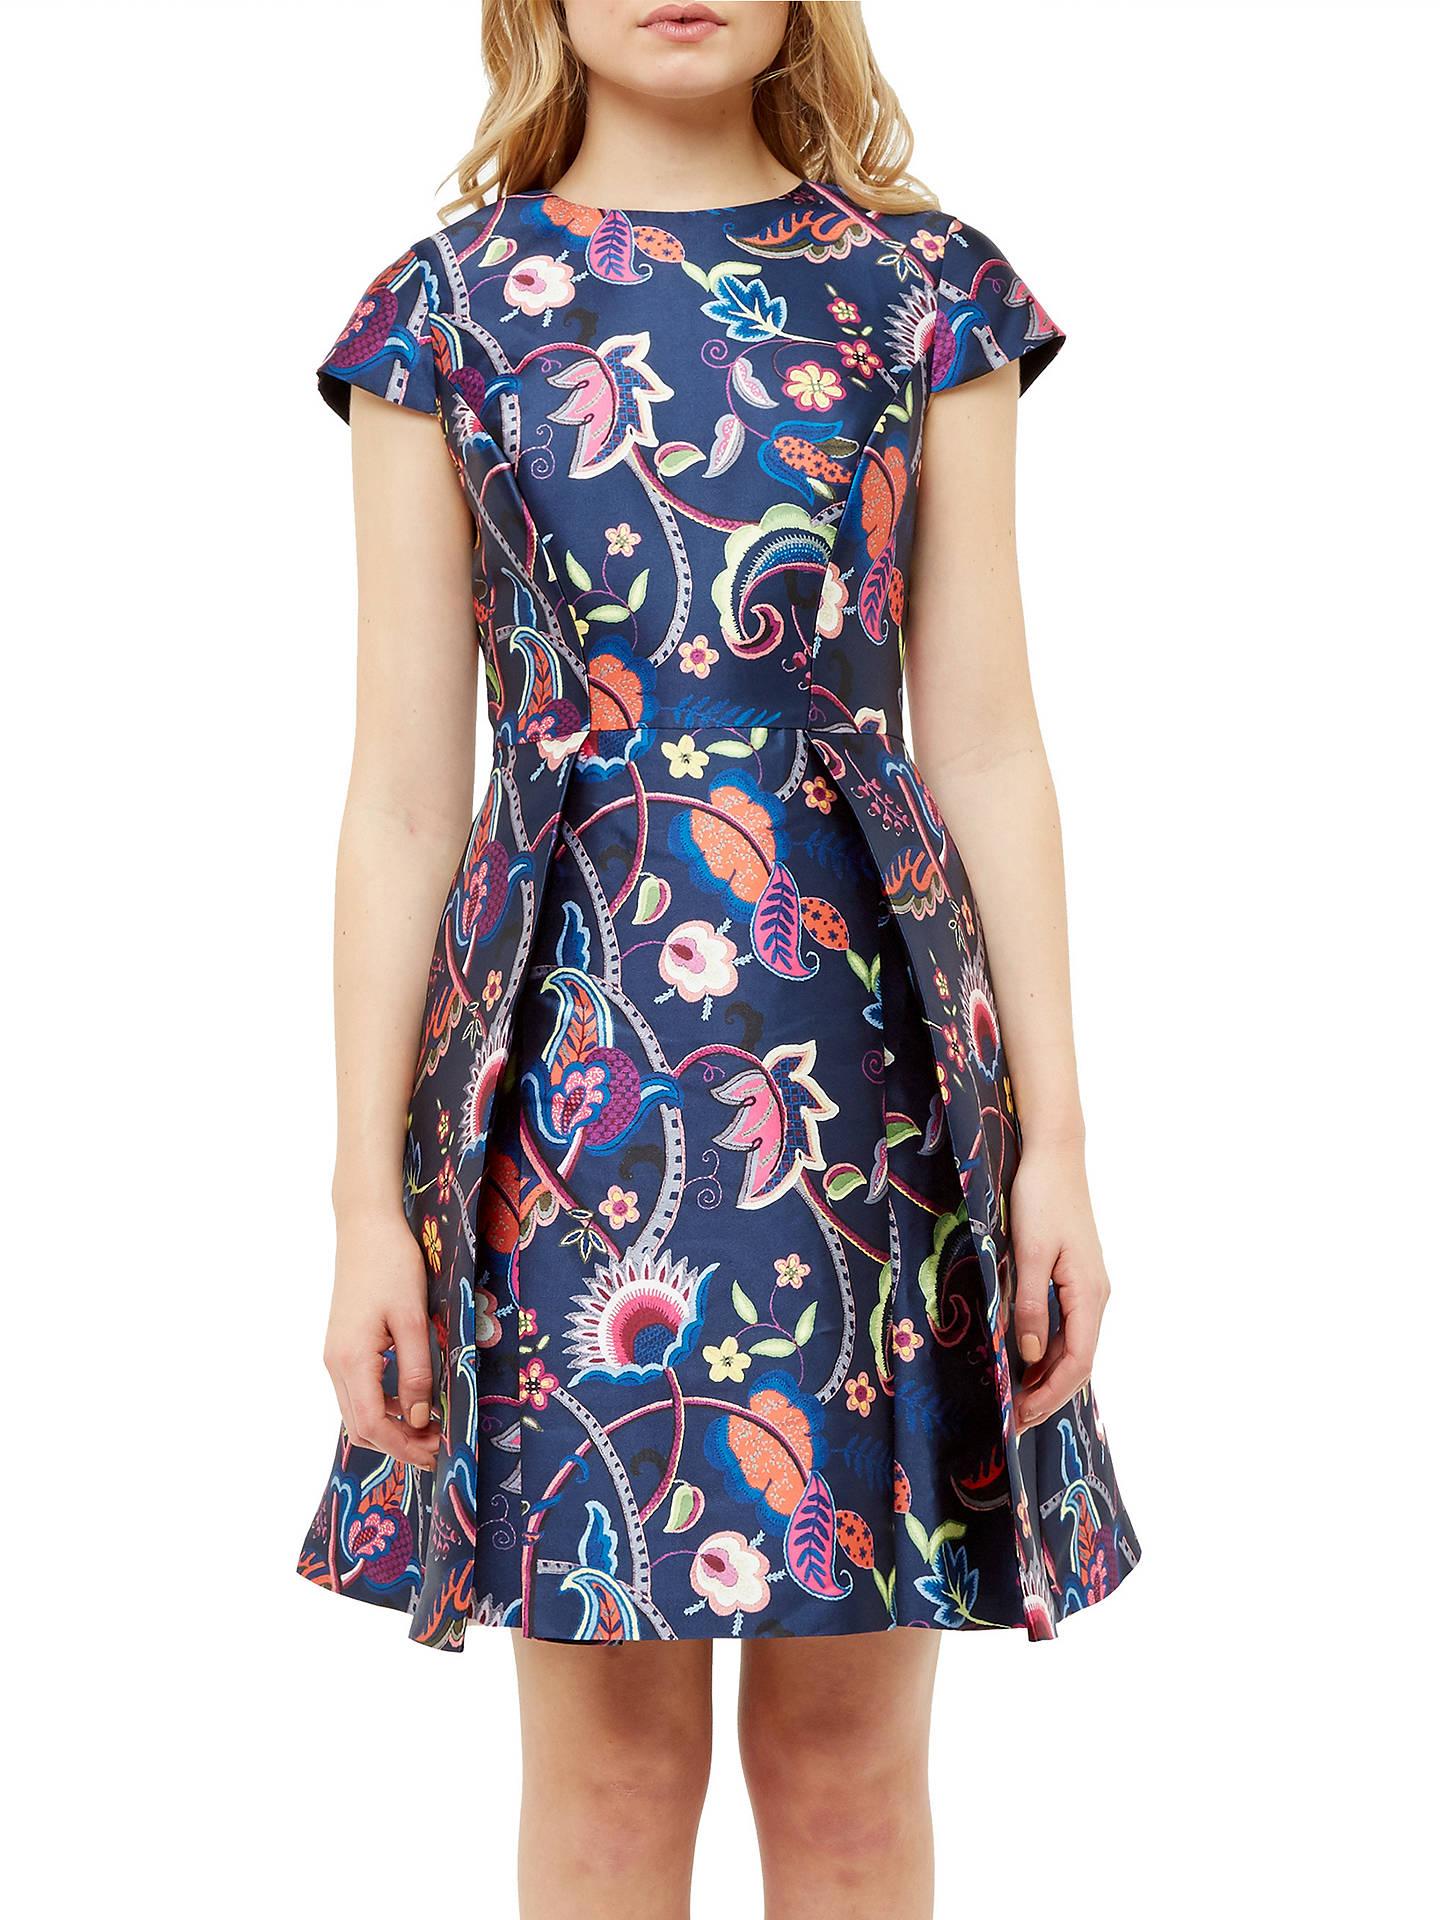 From china ted baker dresses sale house of fraser vintage